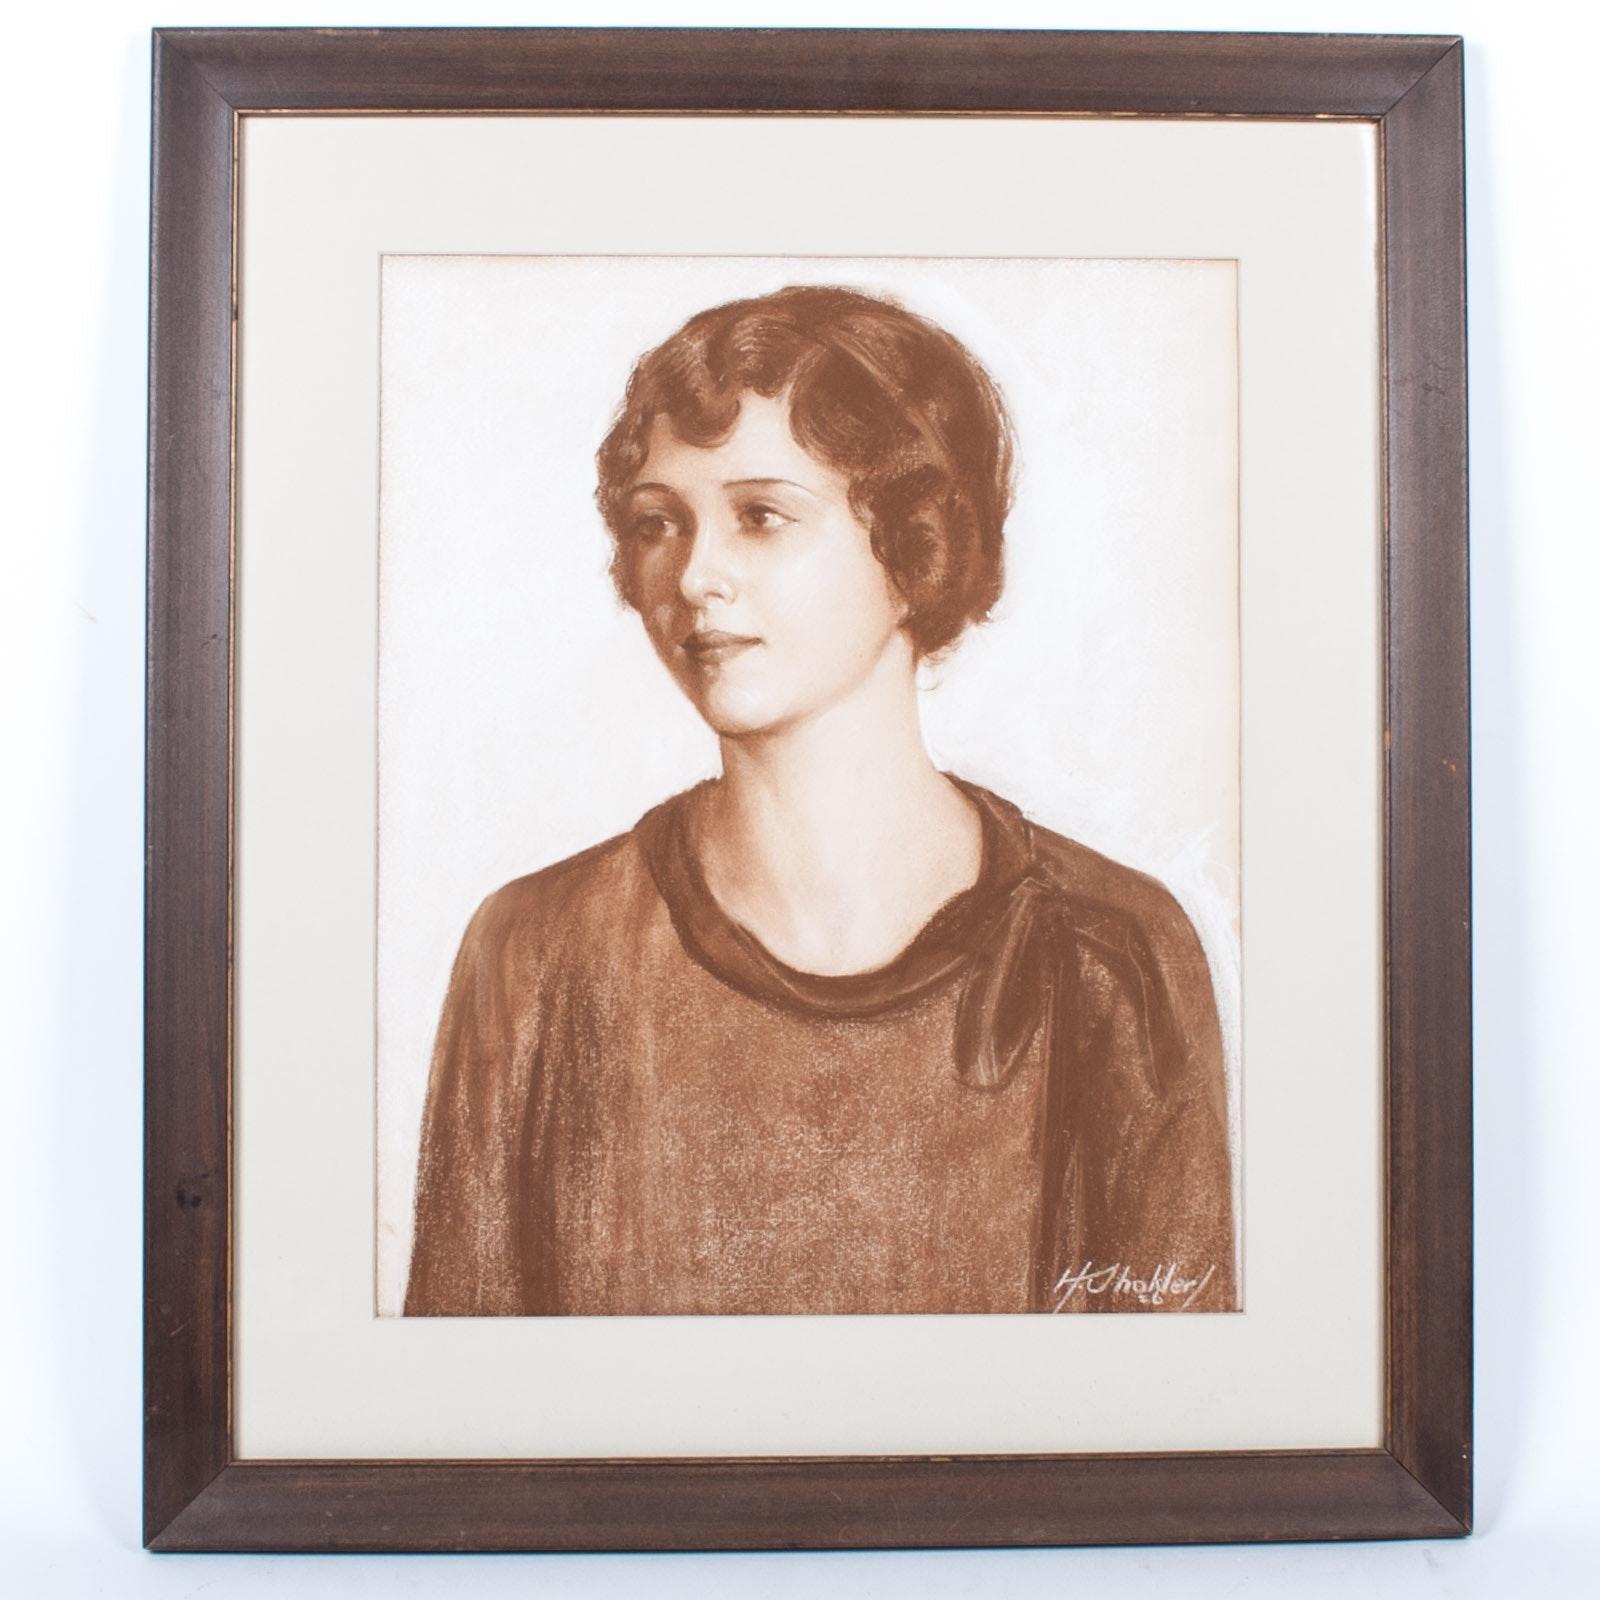 Harry Shokler 1926 Pastel on Paper Portrait of a Woman